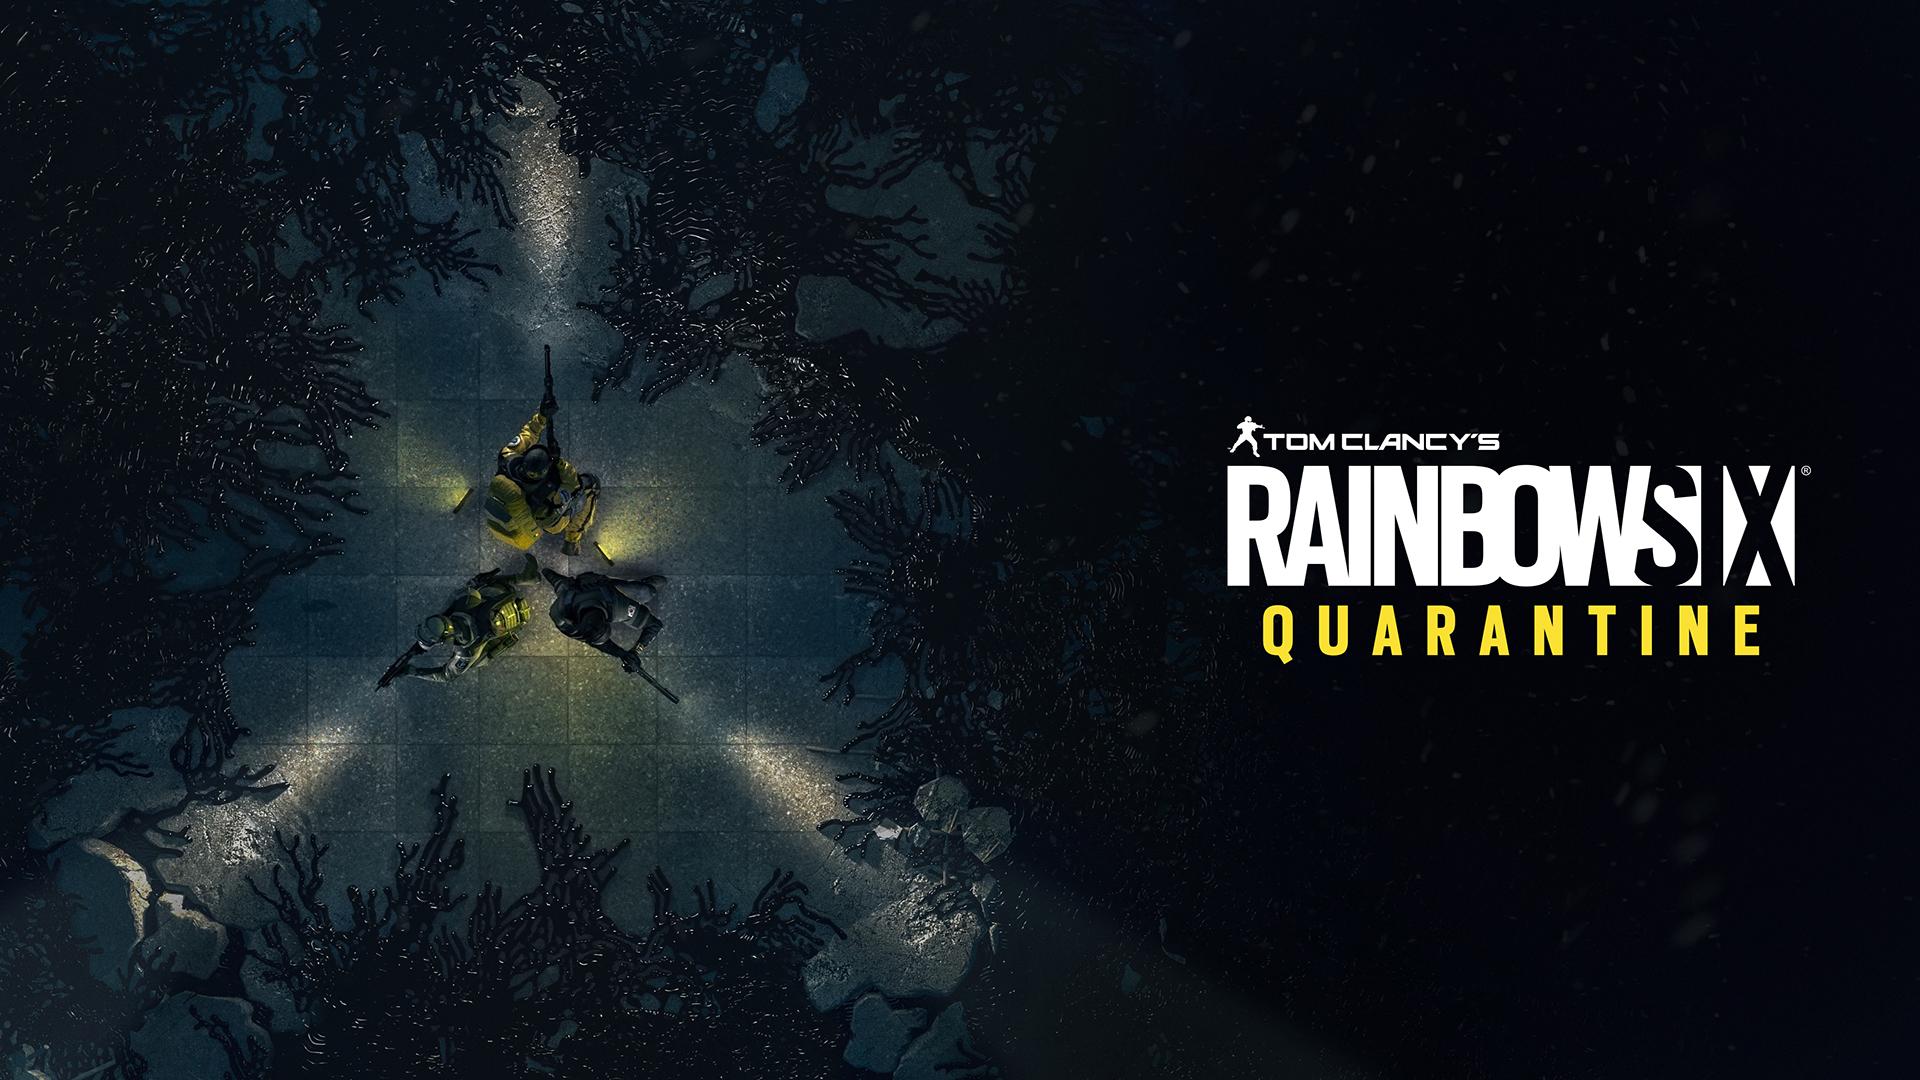 rainbow six quarantine prototype was originally revealed in watch dogs 2 gamesradar gamesradar